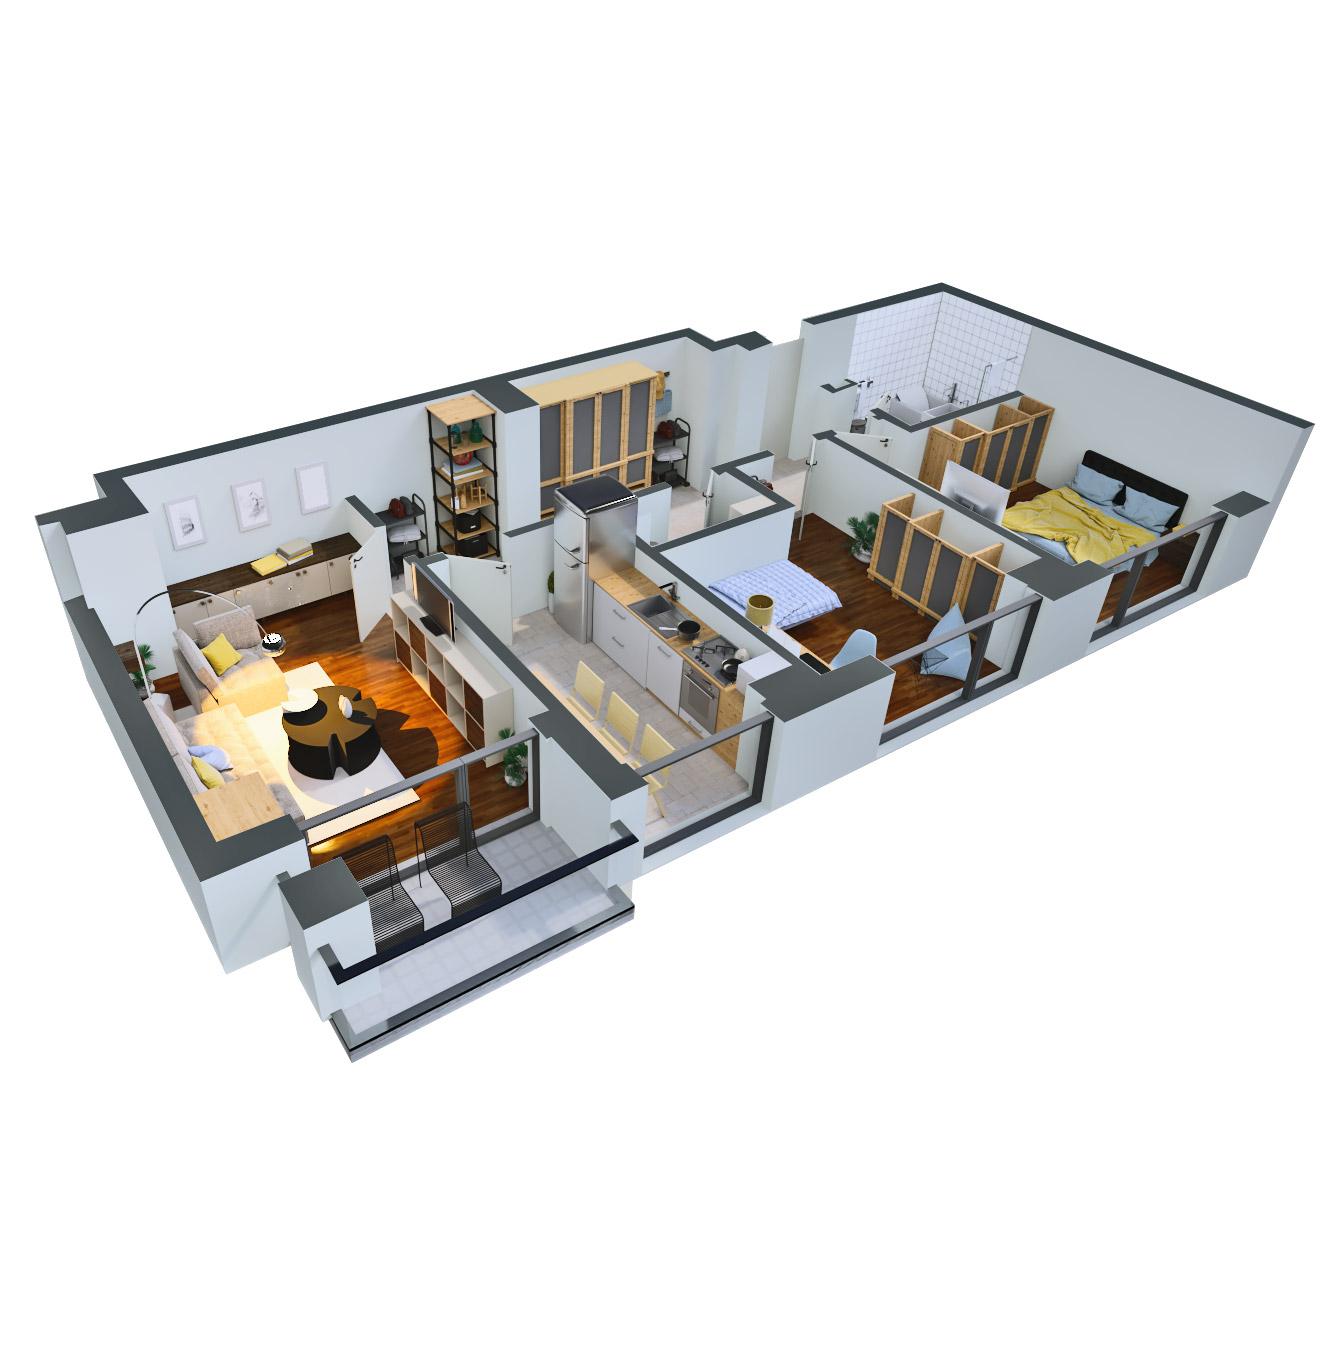 Apartament 3 camere de vanzare Bucuresti - Catedral Residence - Marriott, Piata Unirii, 13 Septembrie, Izvor - Tip 2 - T2 - B